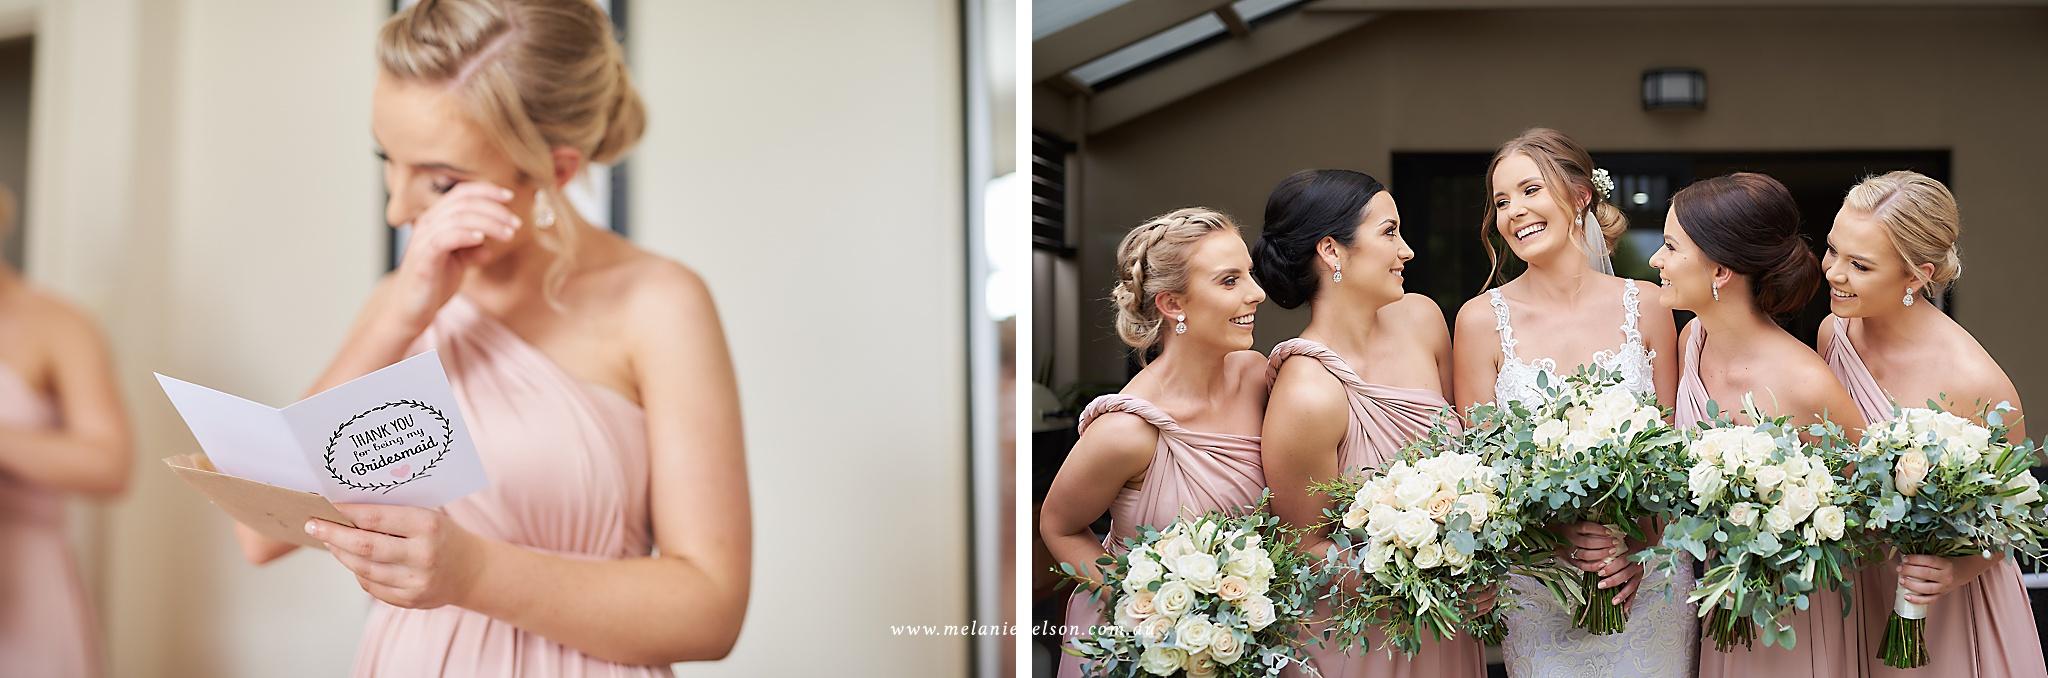 serafino_wedding_photography_0020.jpg